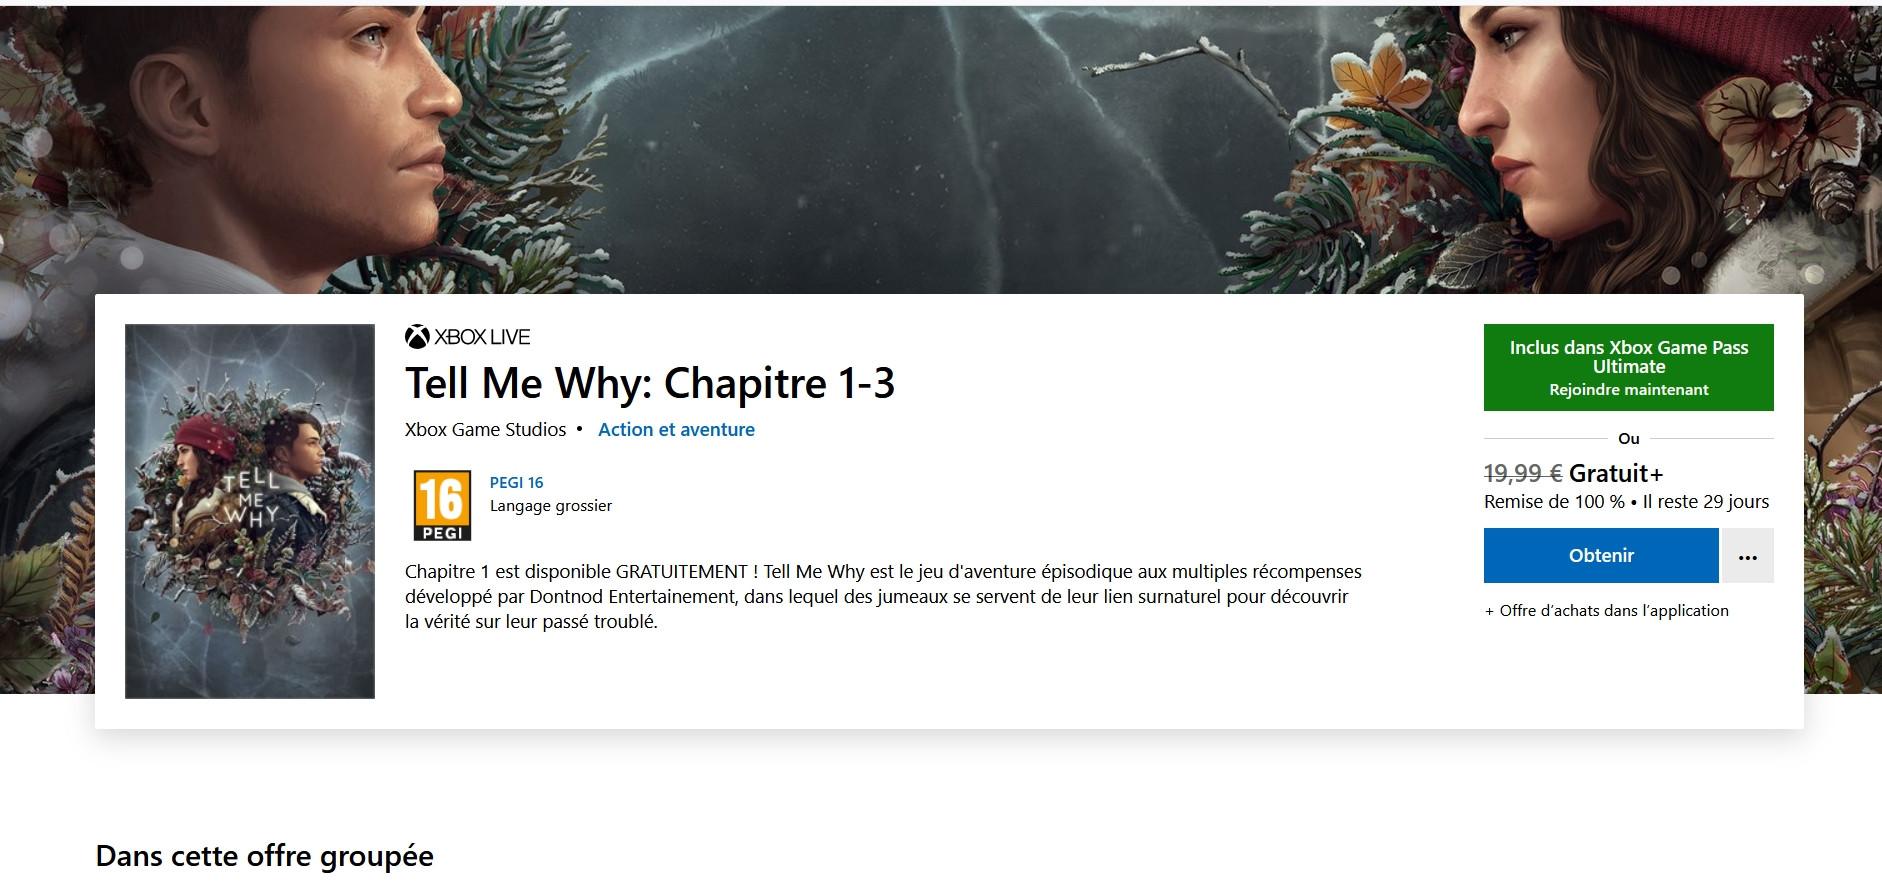 Bon plan: Tell Me Why Chapitre 1-3 gratuit